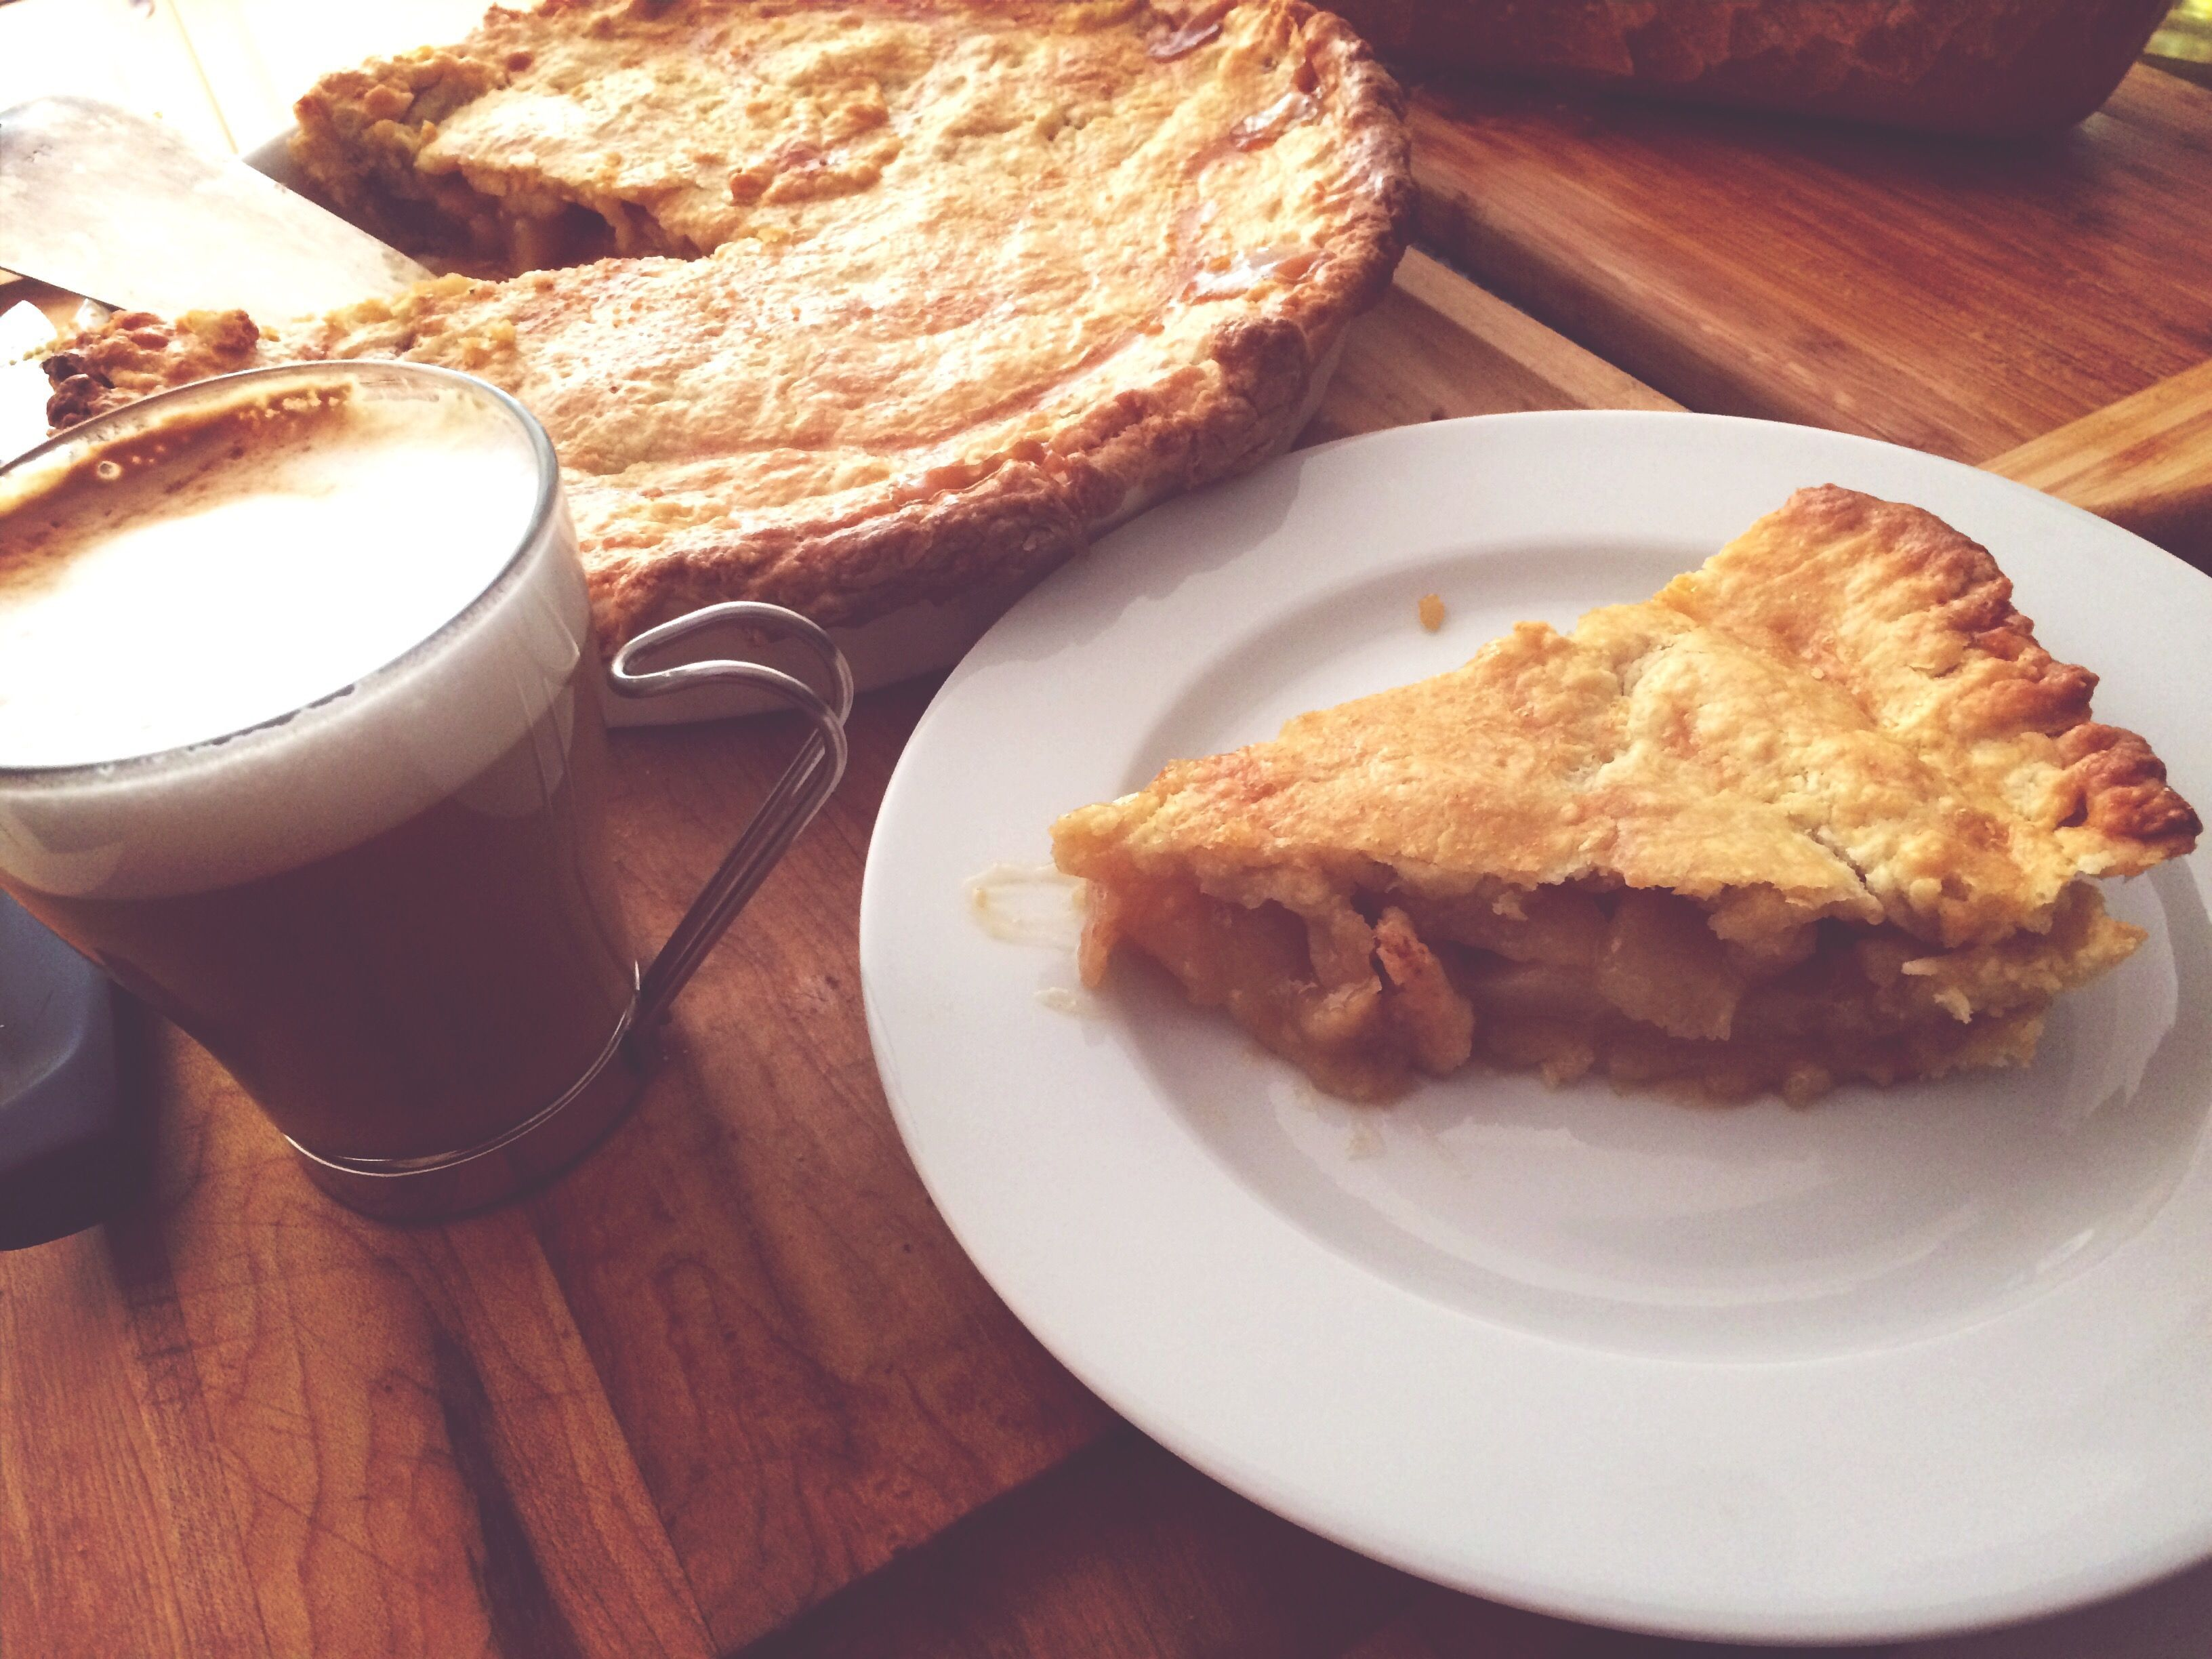 Authentic Polish Szarlotka Apple Tart or Pie Recipe